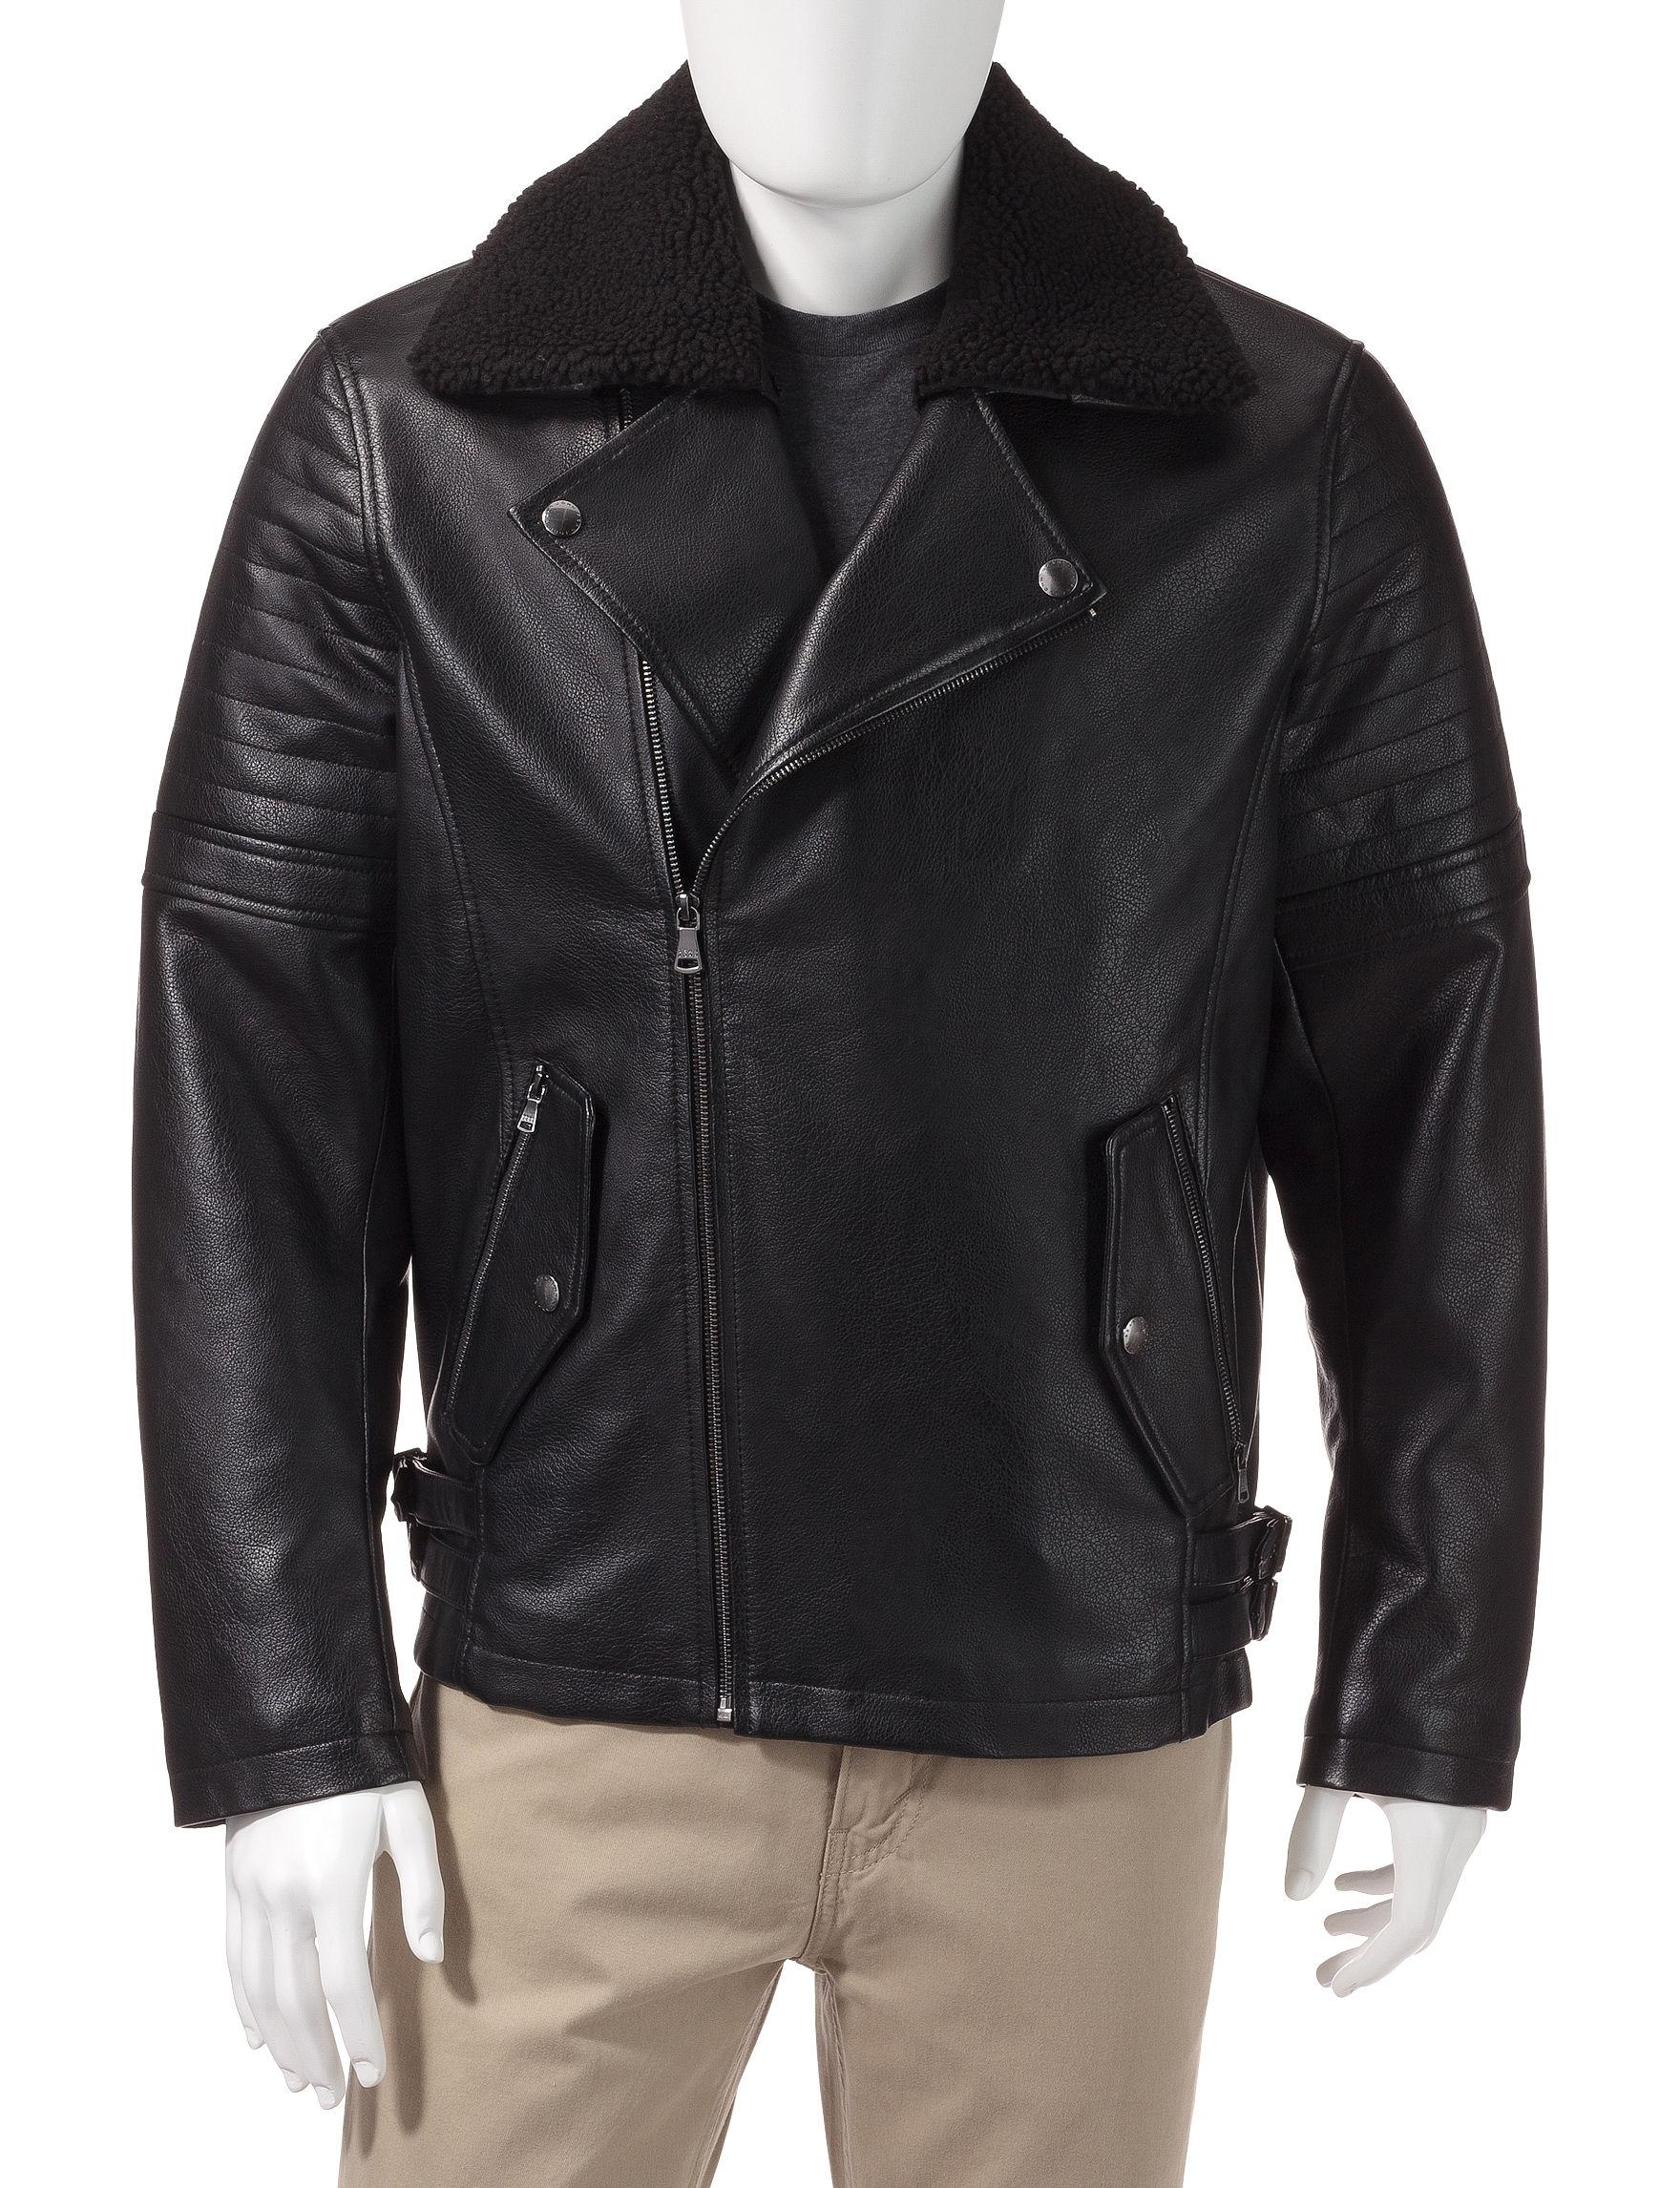 Sean John Black Bomber & Moto Jackets